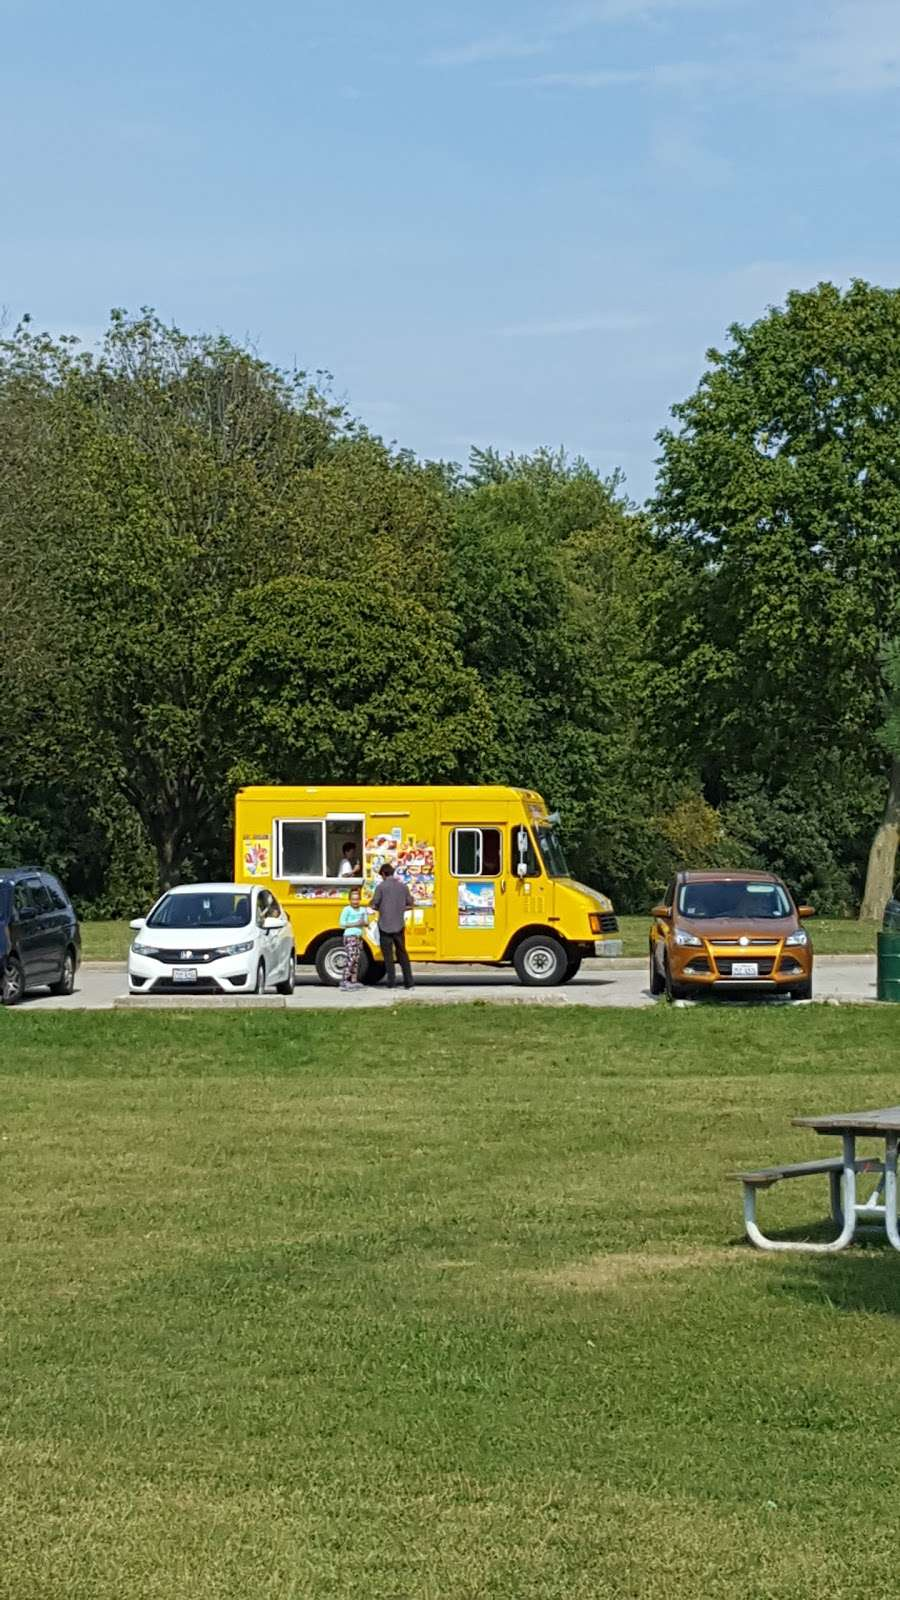 Midlothian Meadows - park  | Photo 4 of 10 | Address: W 155th St, Midlothian, IL 60445, USA | Phone: (708) 447-0090